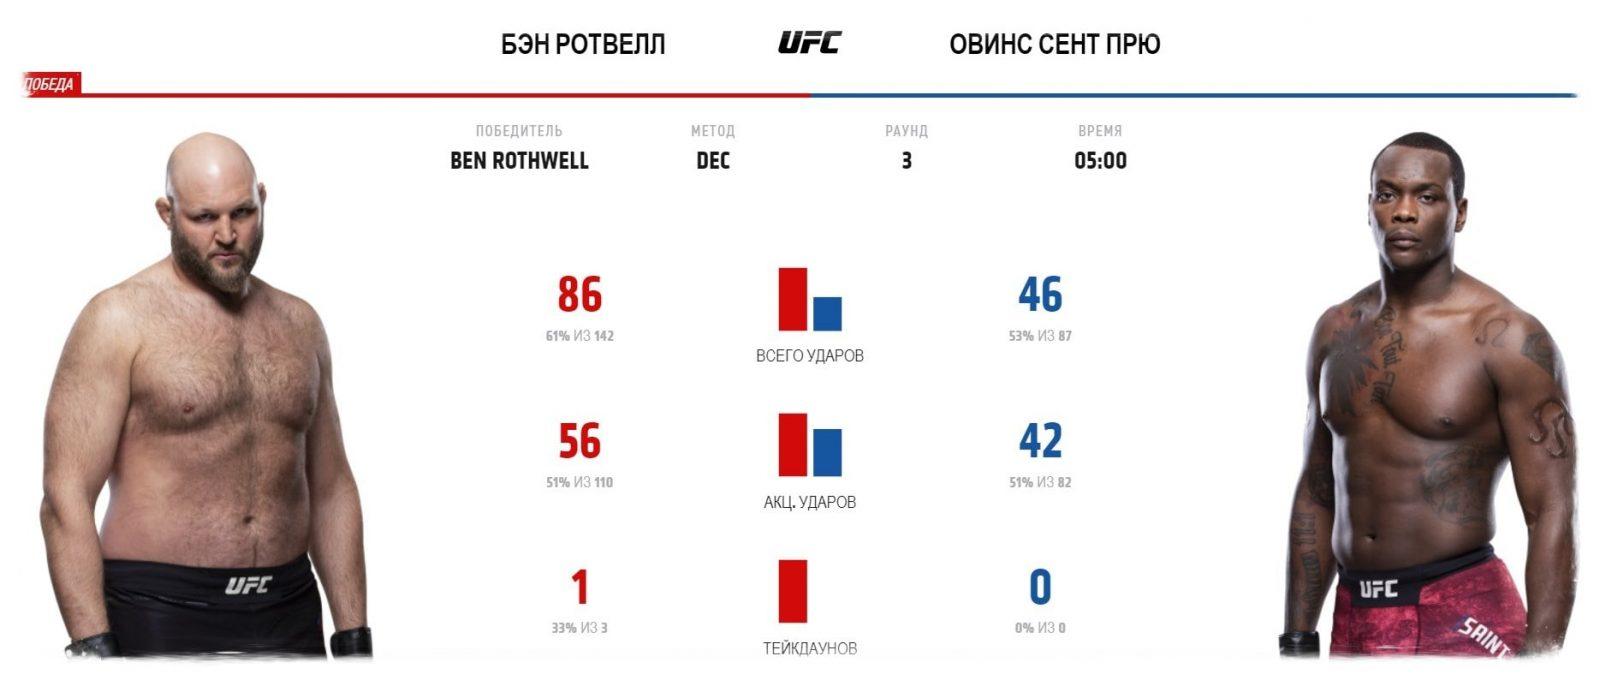 ben-rotvell-ovins-sent-pryu-video-boya-ufc-fight-night-smith-vs-teixeira